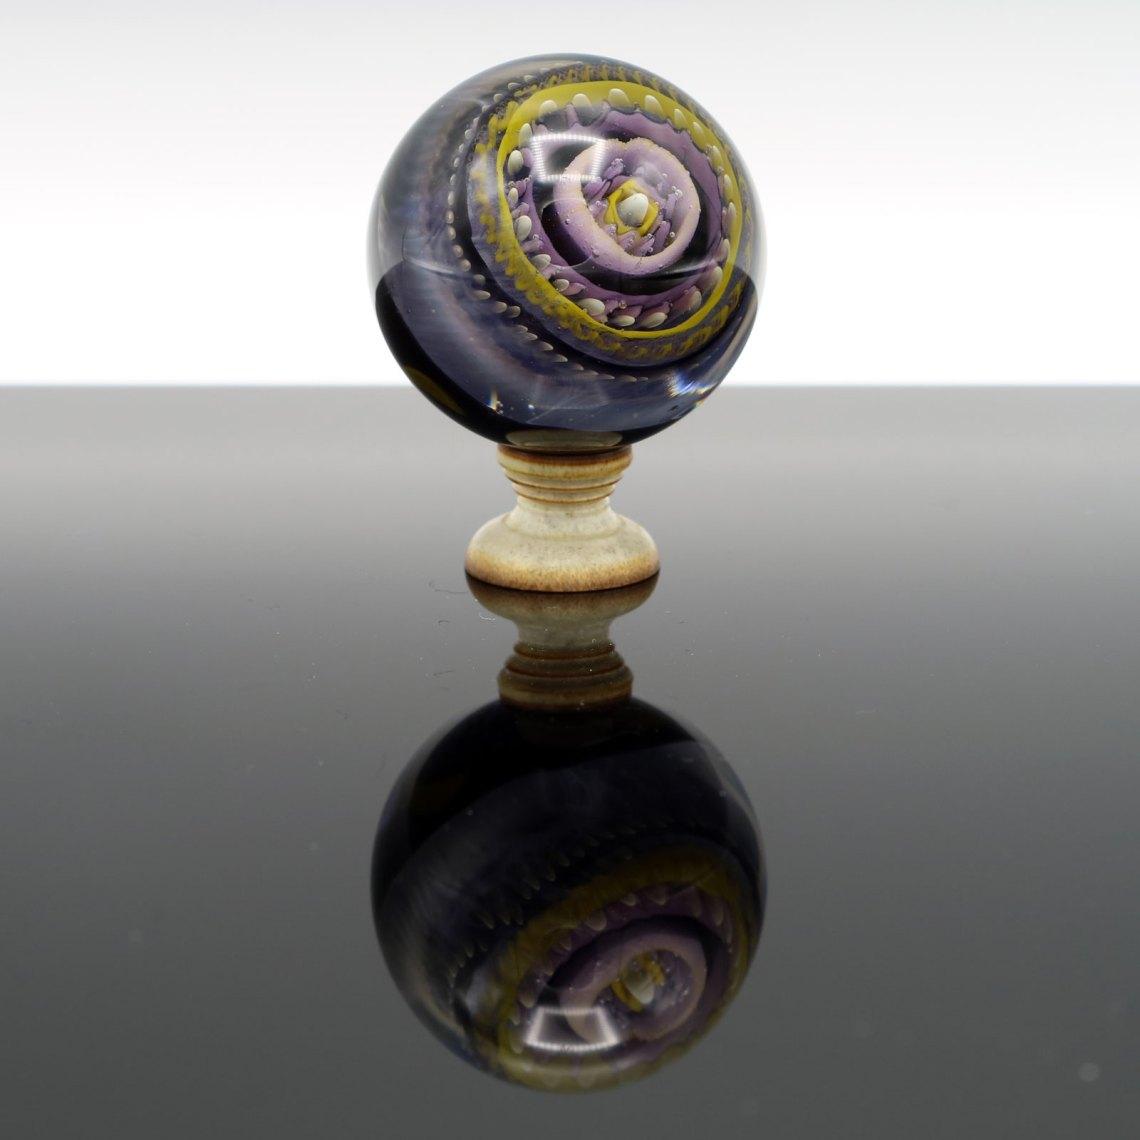 Shana Glassgirl – Small Trippy Marble